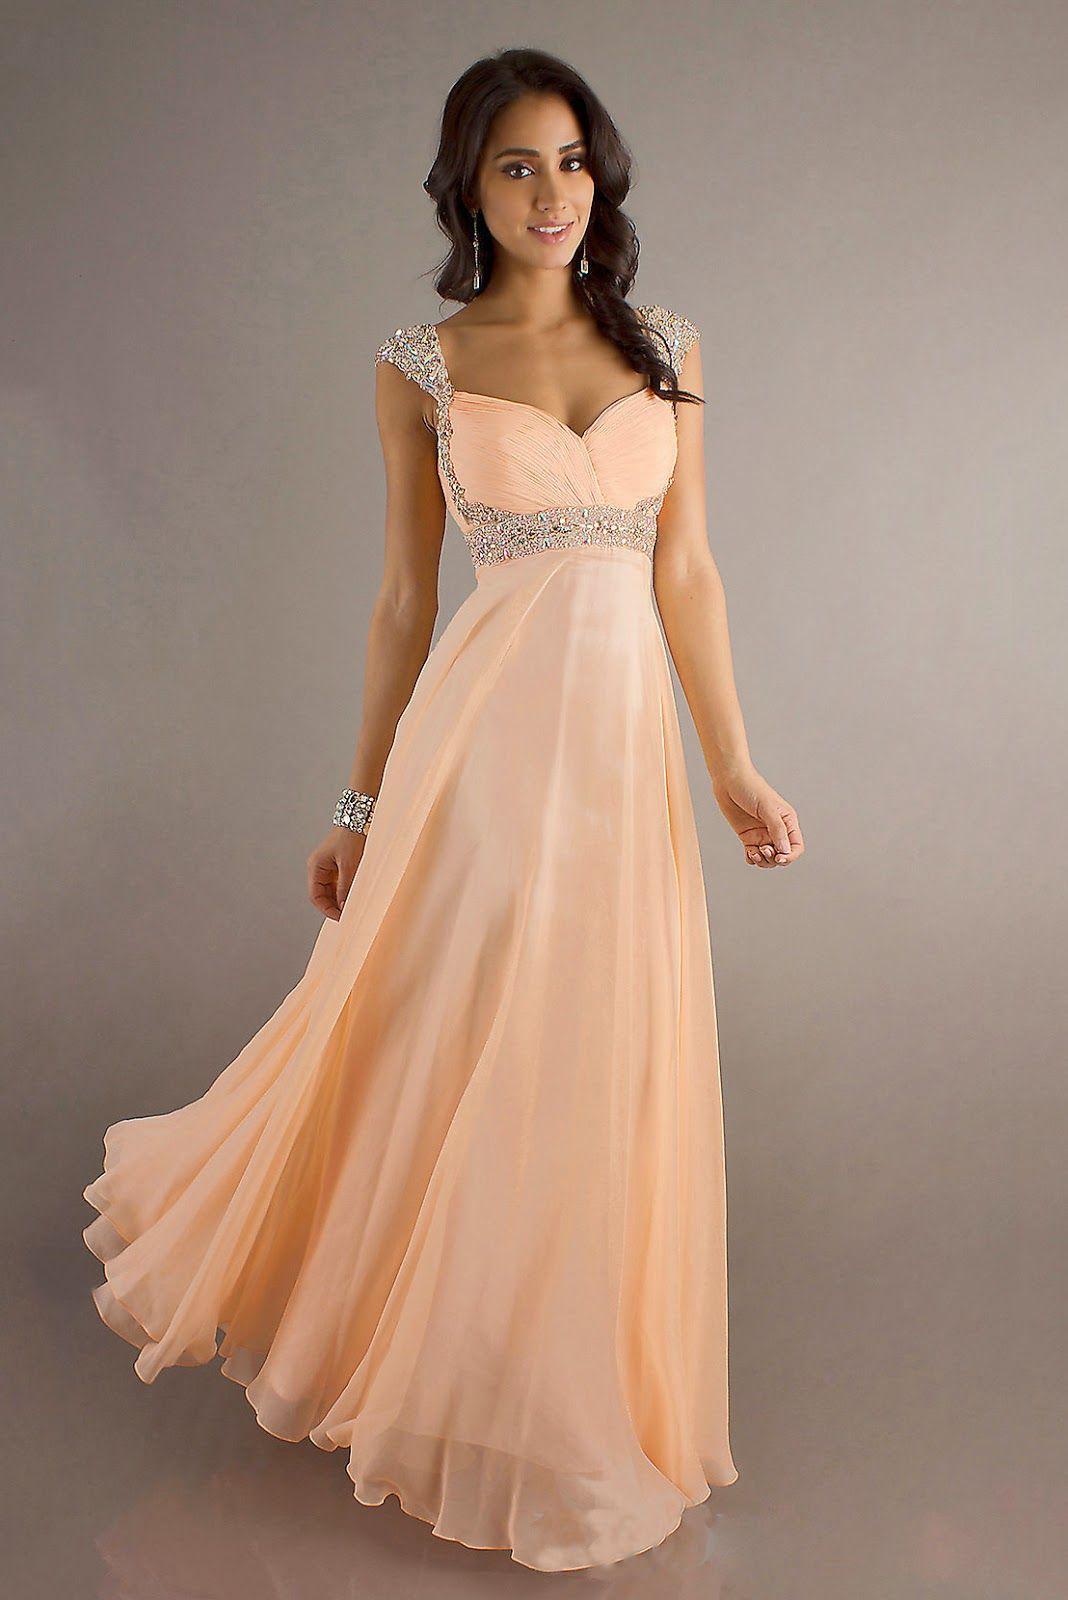 2da747d5c Hermosos vestidos de fiesta para embarazadas